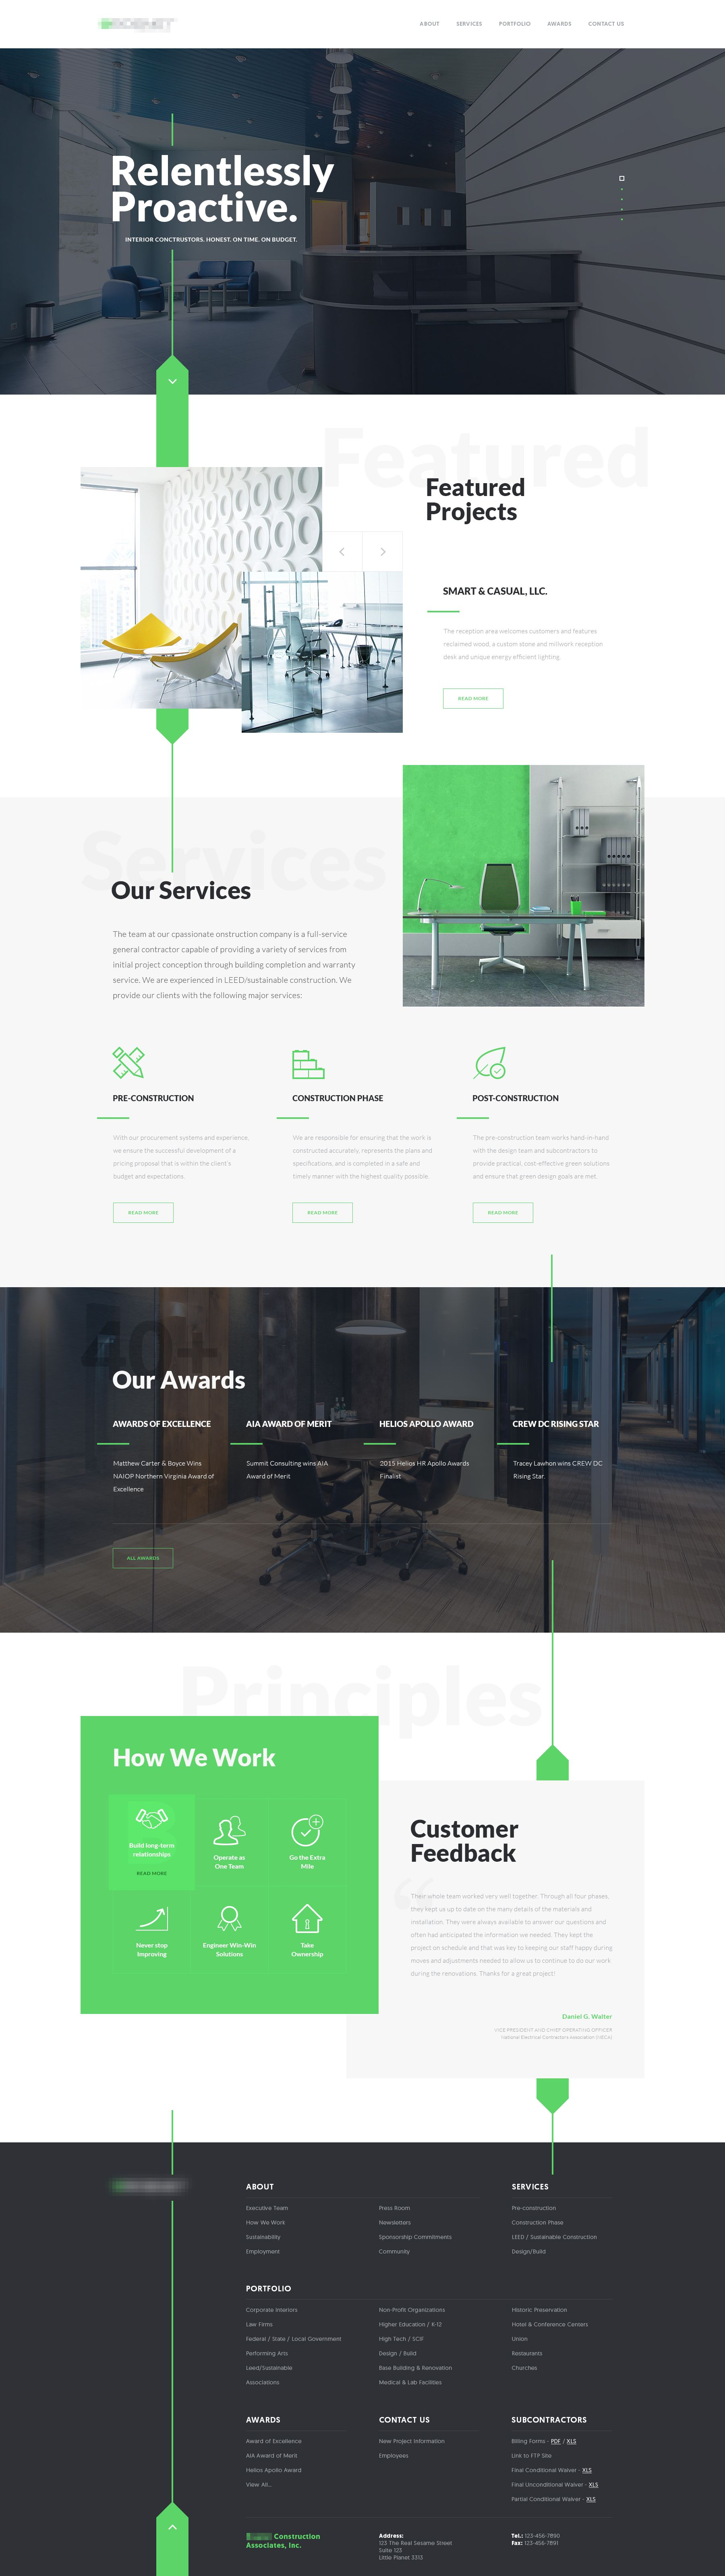 Interior Construction Company Website Design